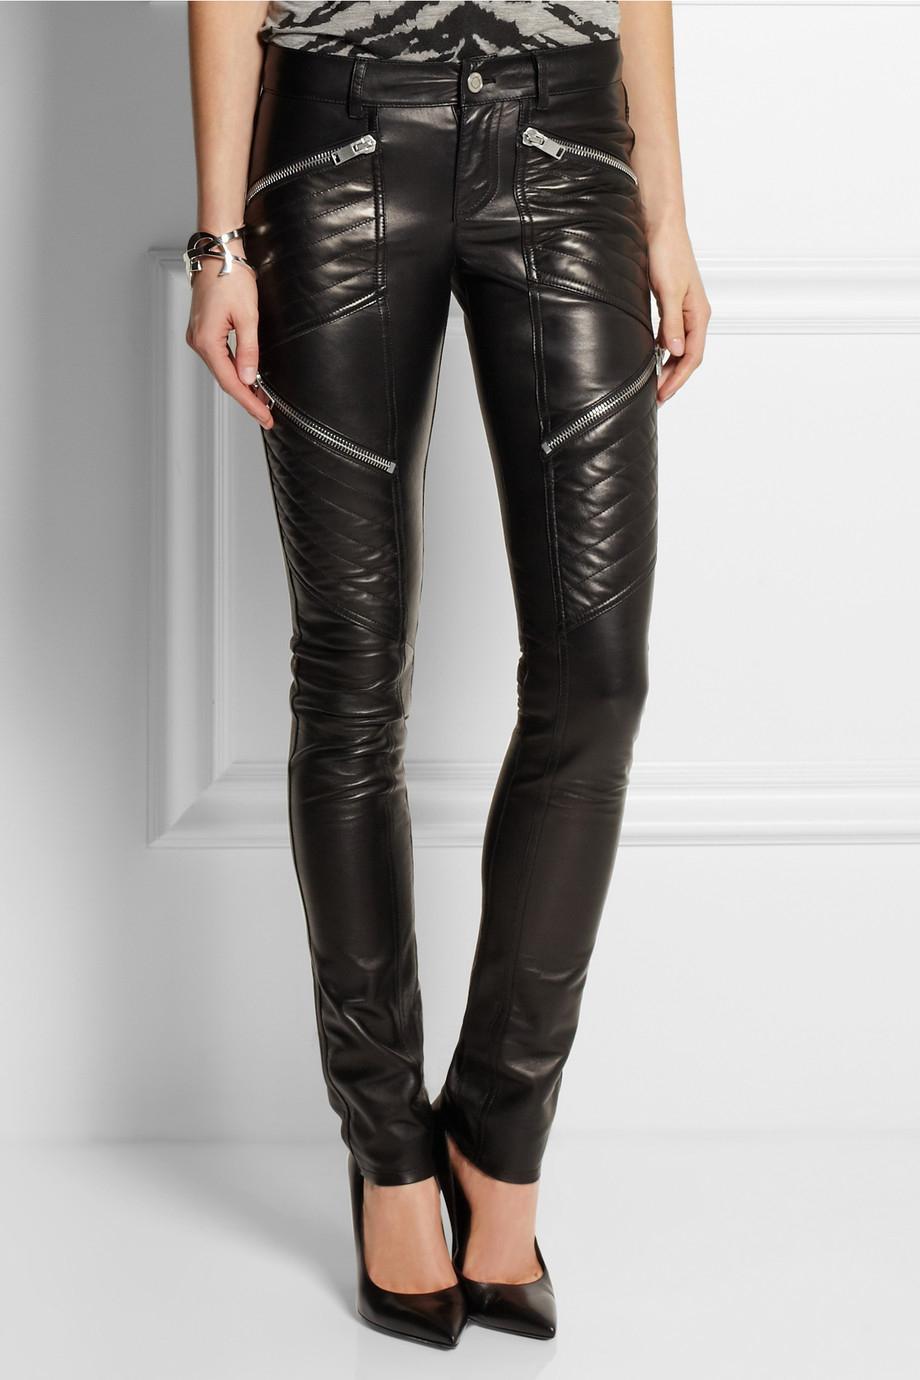 Awesome  Gt Clothing Gt Pants Gt Women39s PU Leather Fleece Inside Skinny